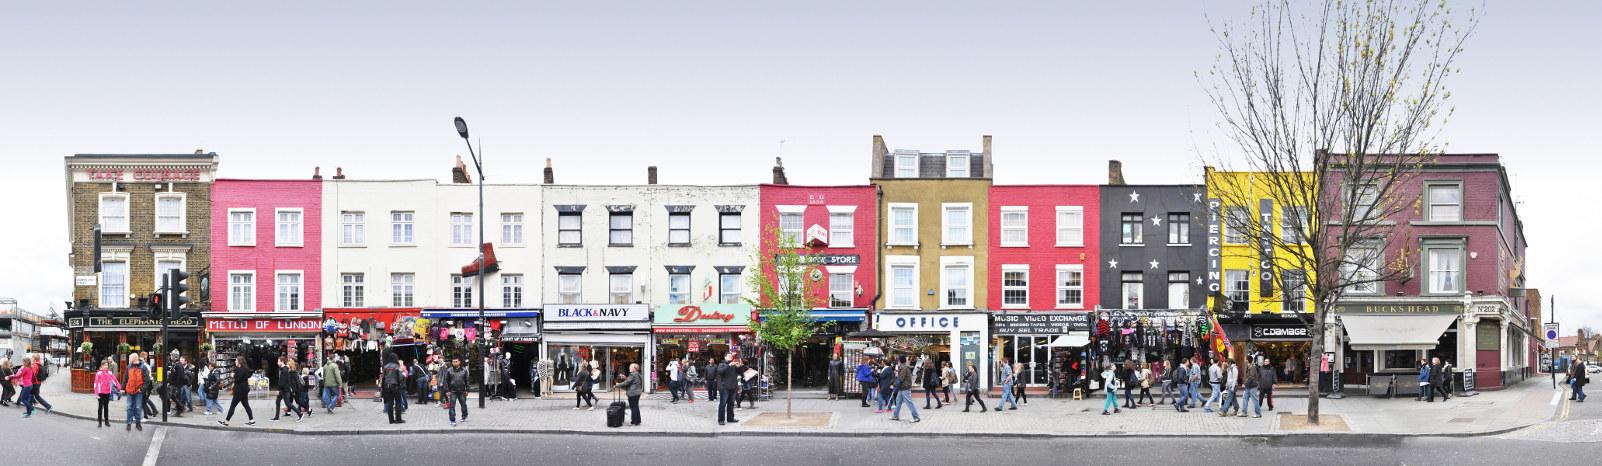 Camden High Street 202-224 • London • United Kingdom Camden